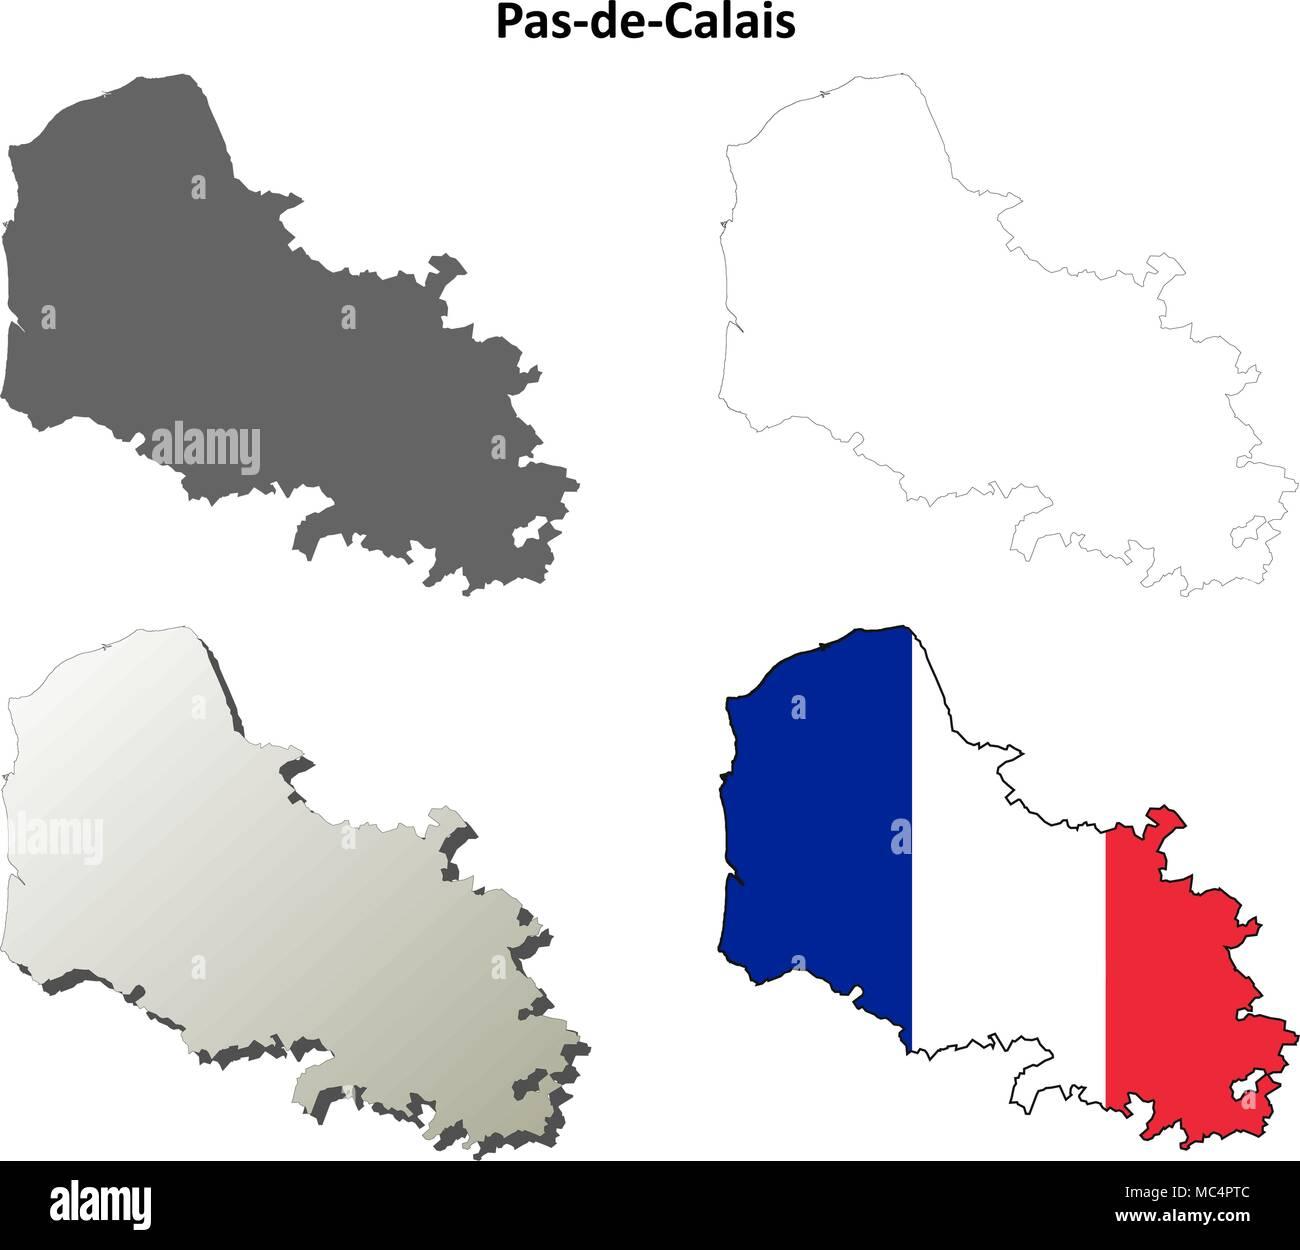 Pas De Calais Map Stock Photos Pas De Calais Map Stock Images Alamy